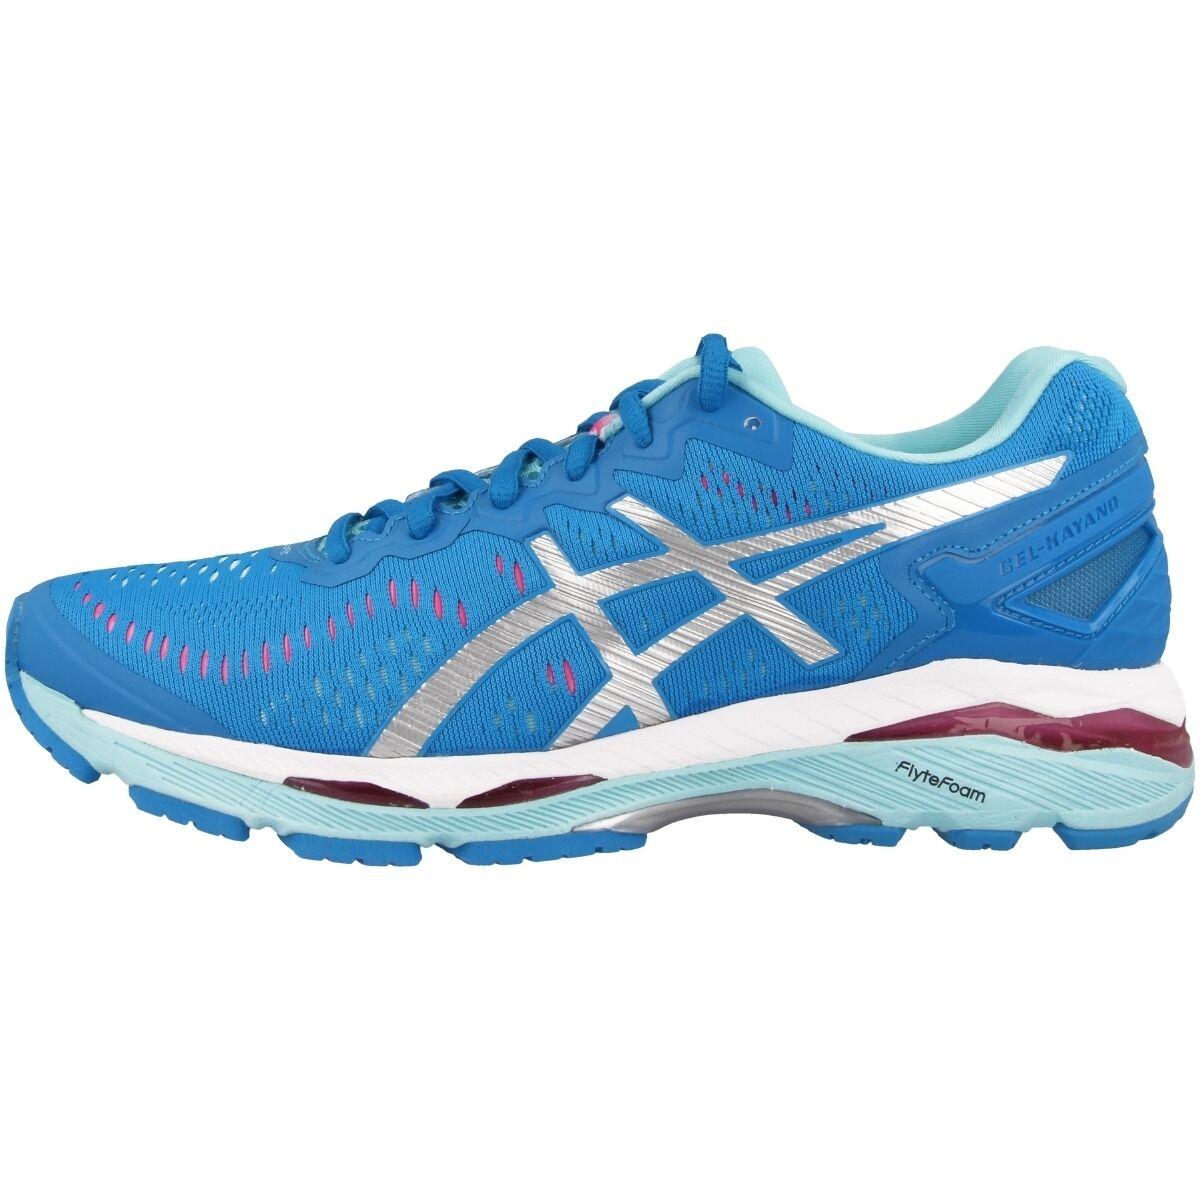 Asics Gel-Kayano 23 Donne shoes da Corsa  blueee silver Aqua T696N-4393  here has the latest